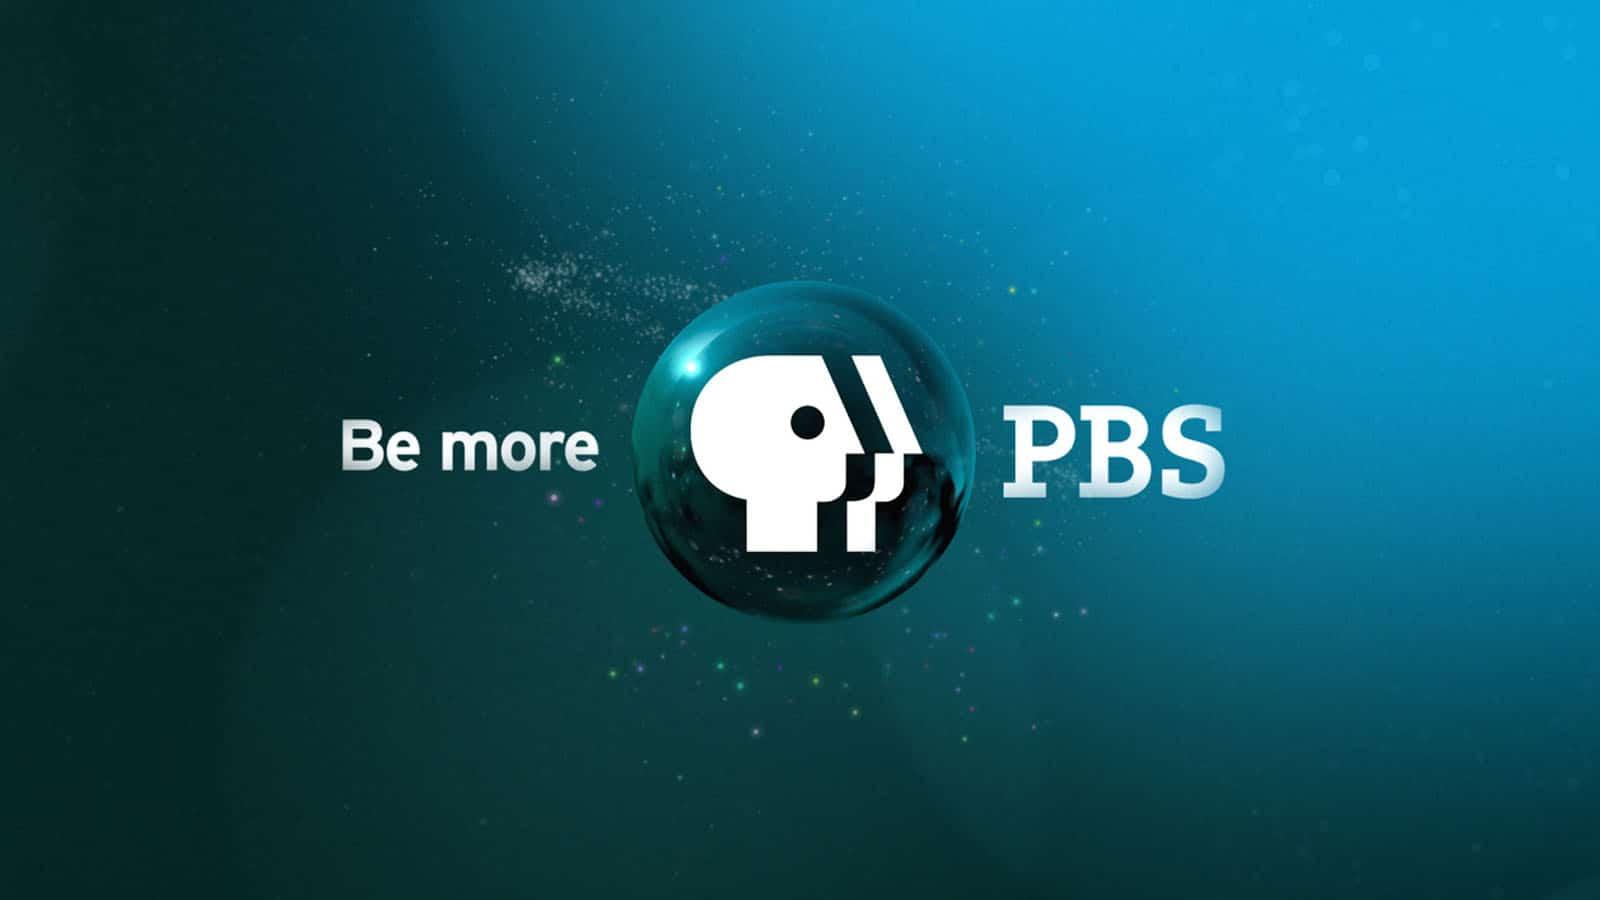 pbs logo on blue background